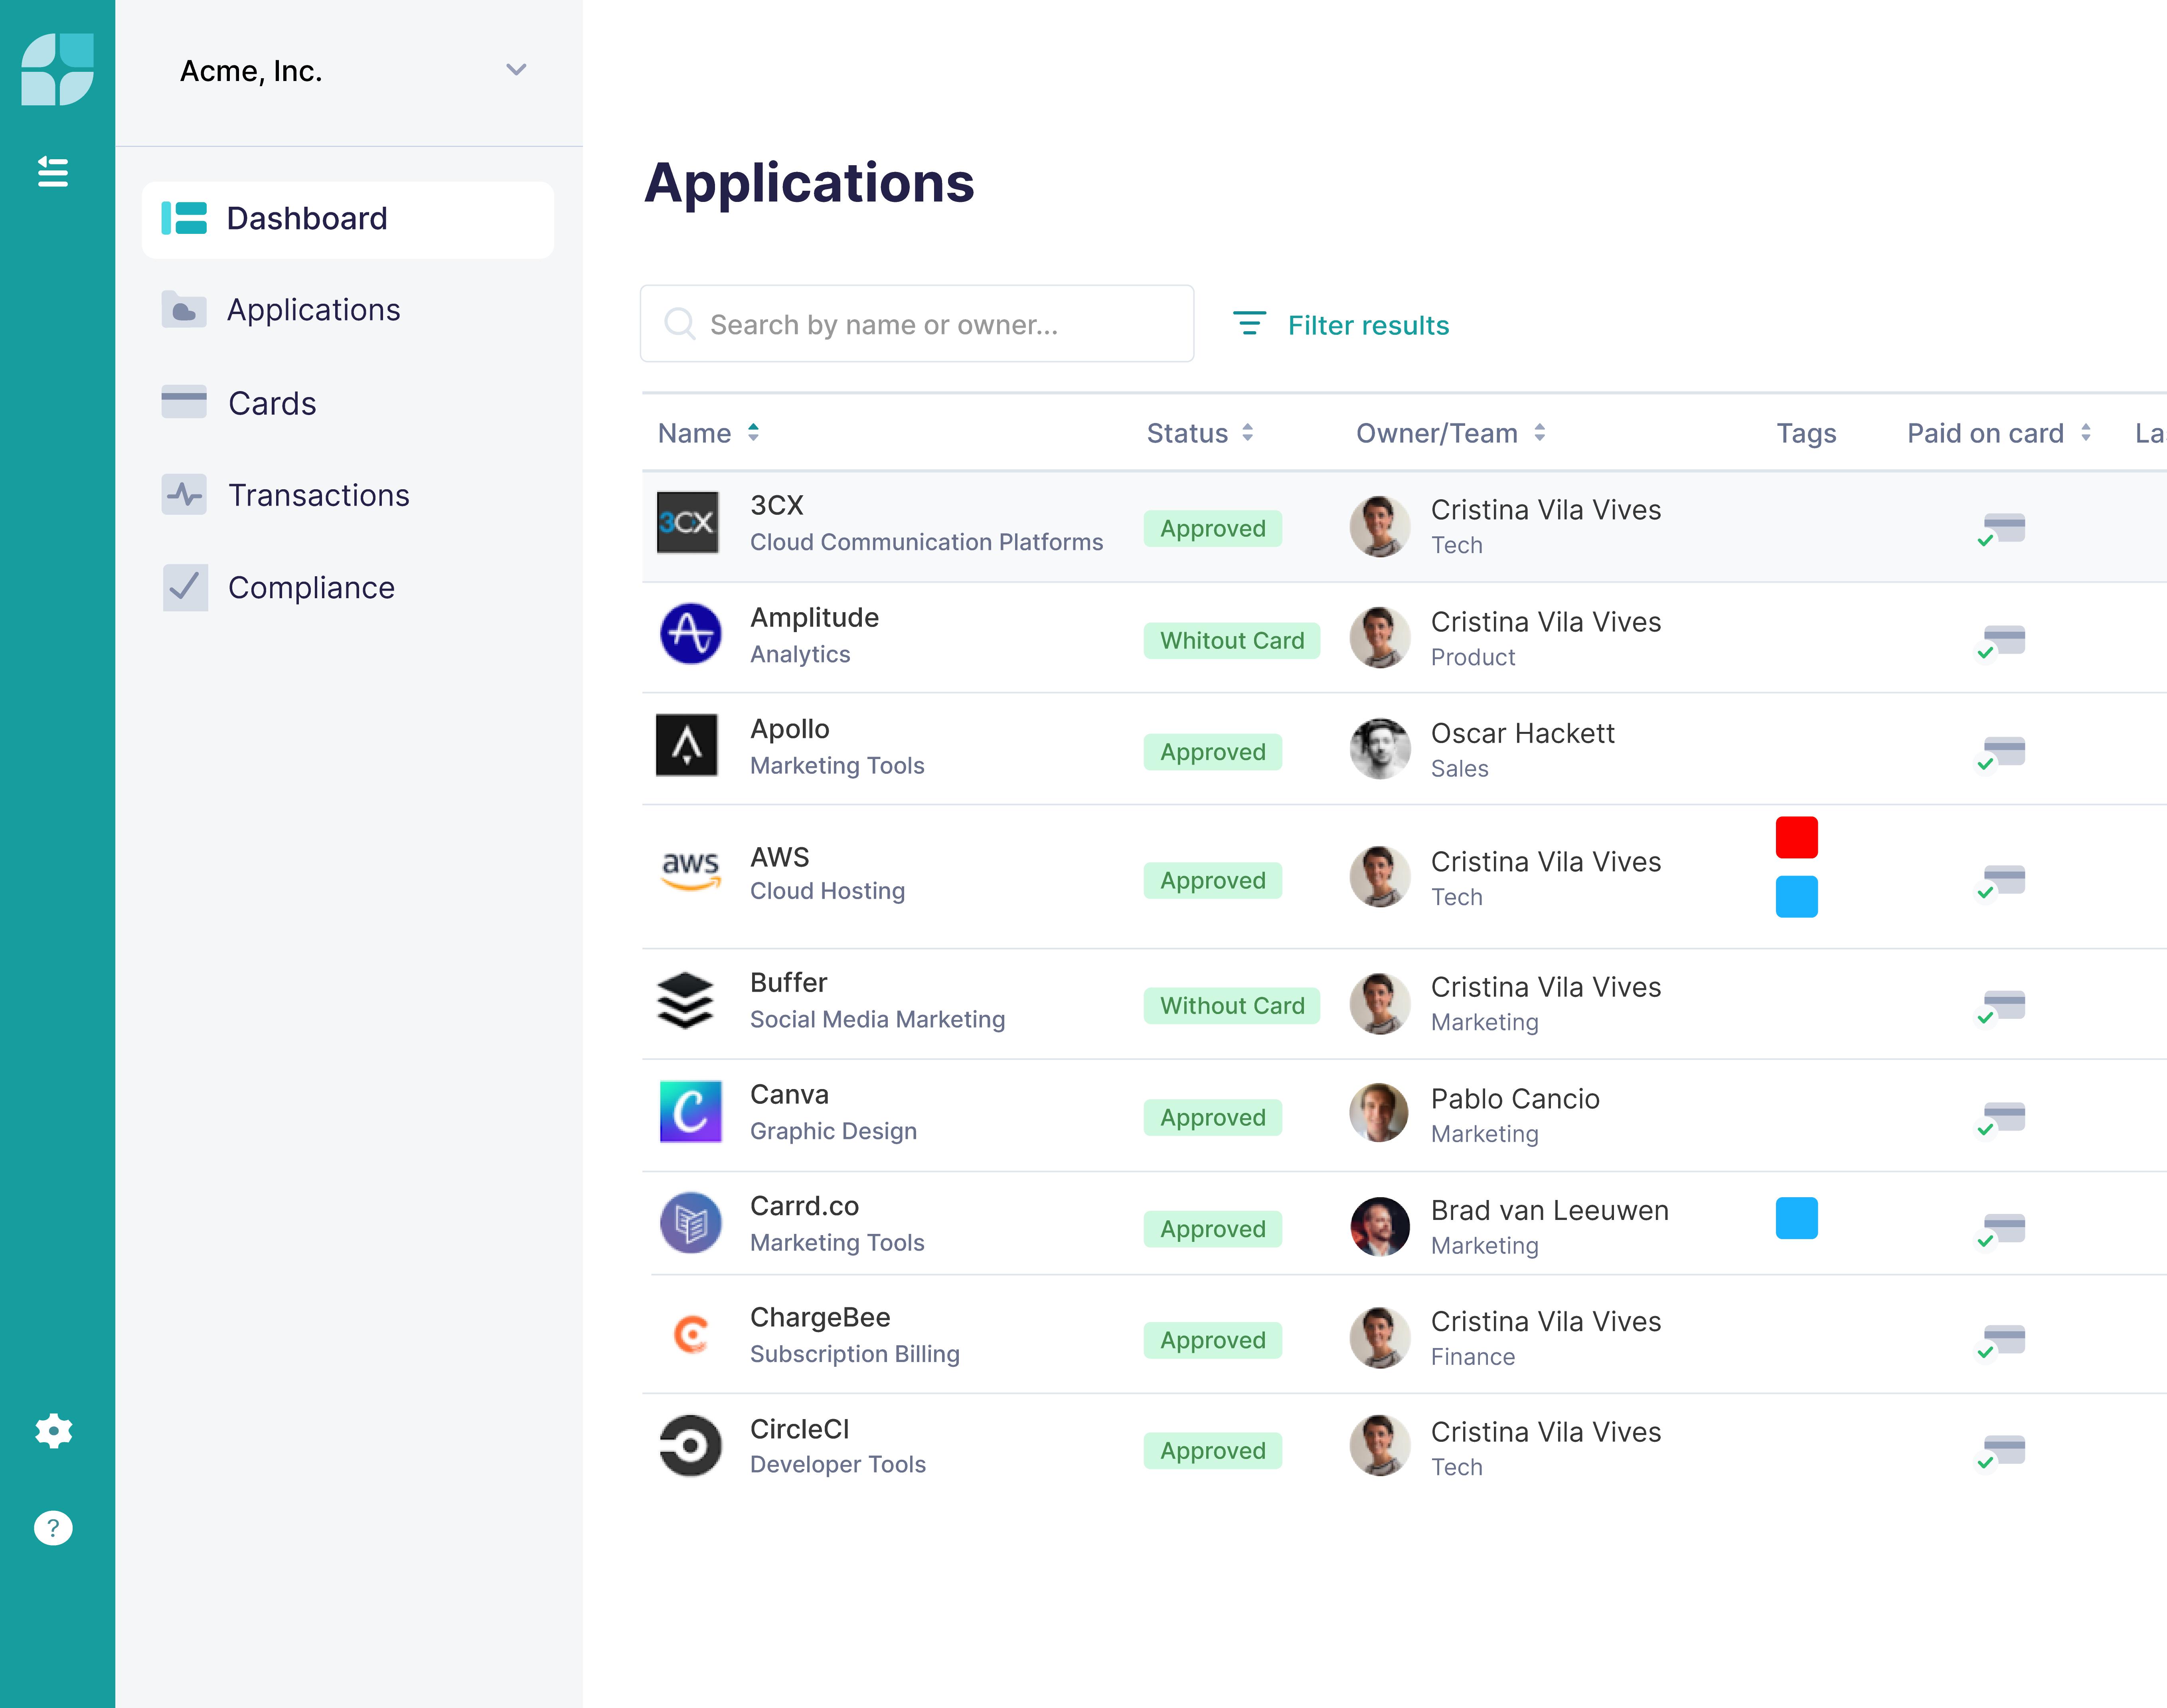 Screenshot of Applications